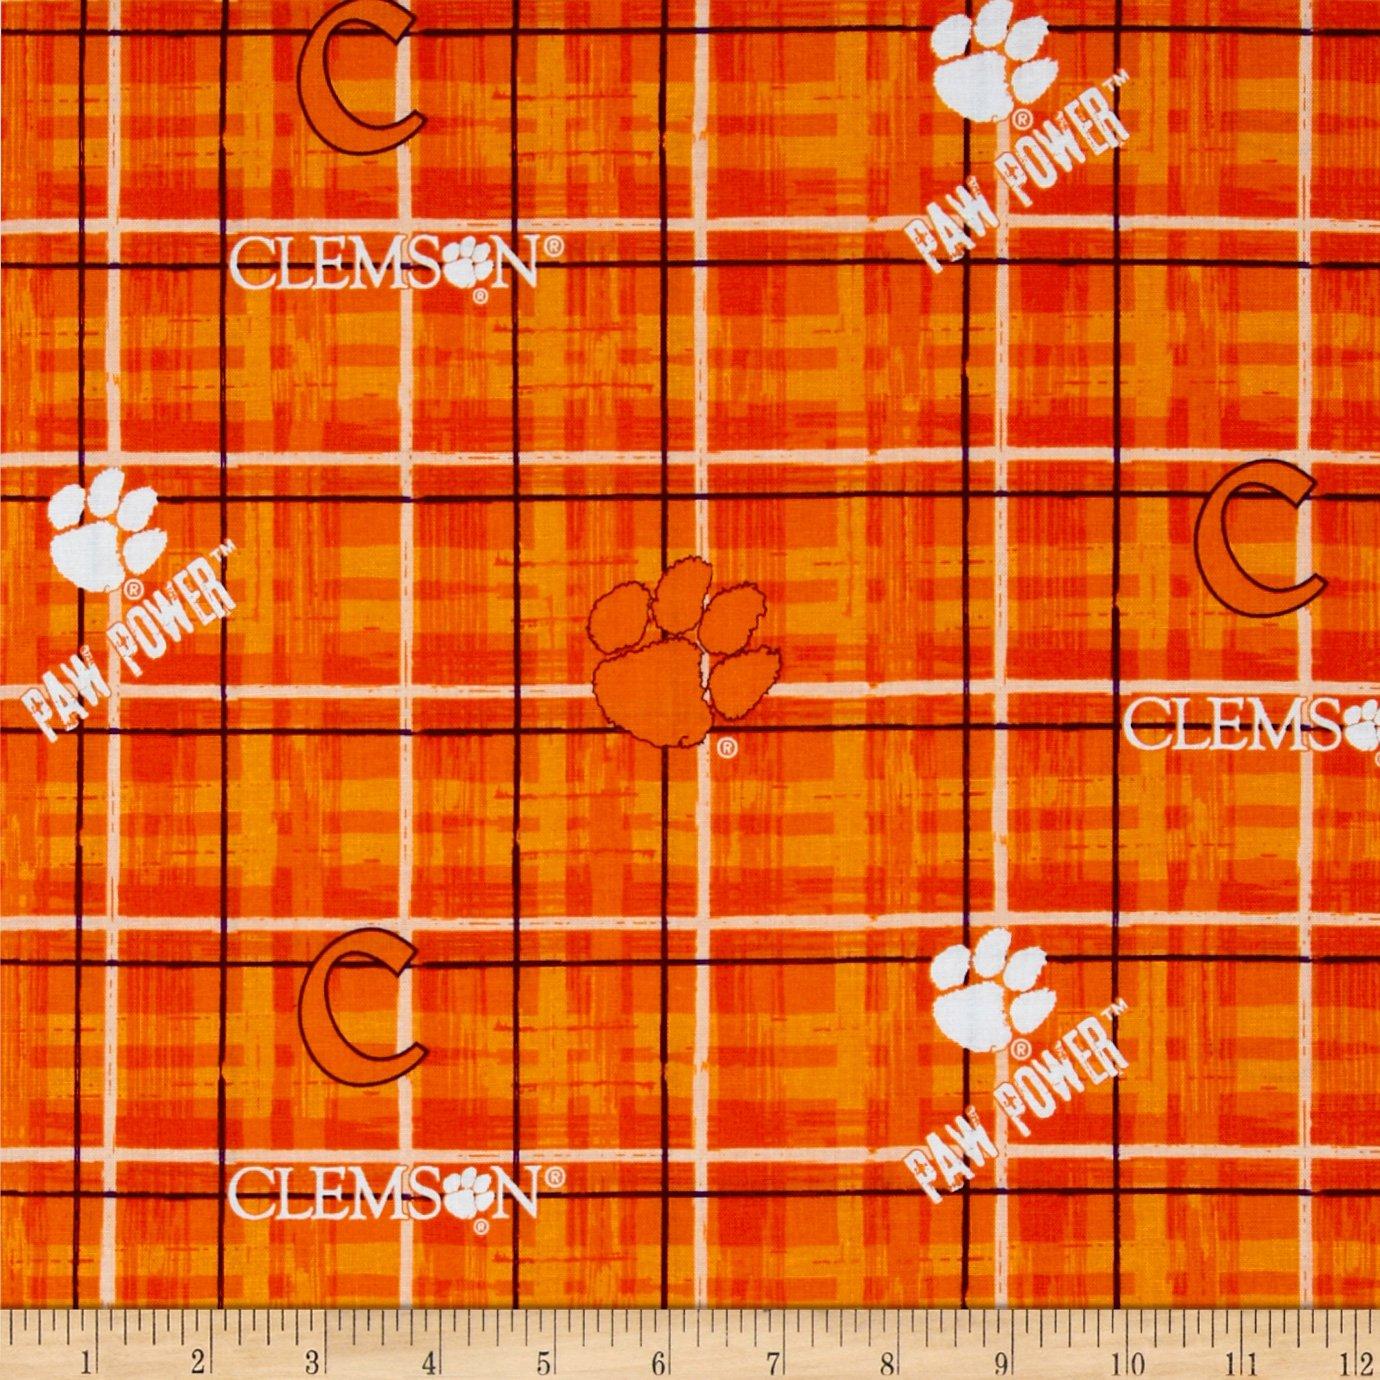 32780036b9b Amazon.com: Sykel Enterprises Collegiate Cotton Broadcloth Clemson Tigers  Fabric by The Yard Multi